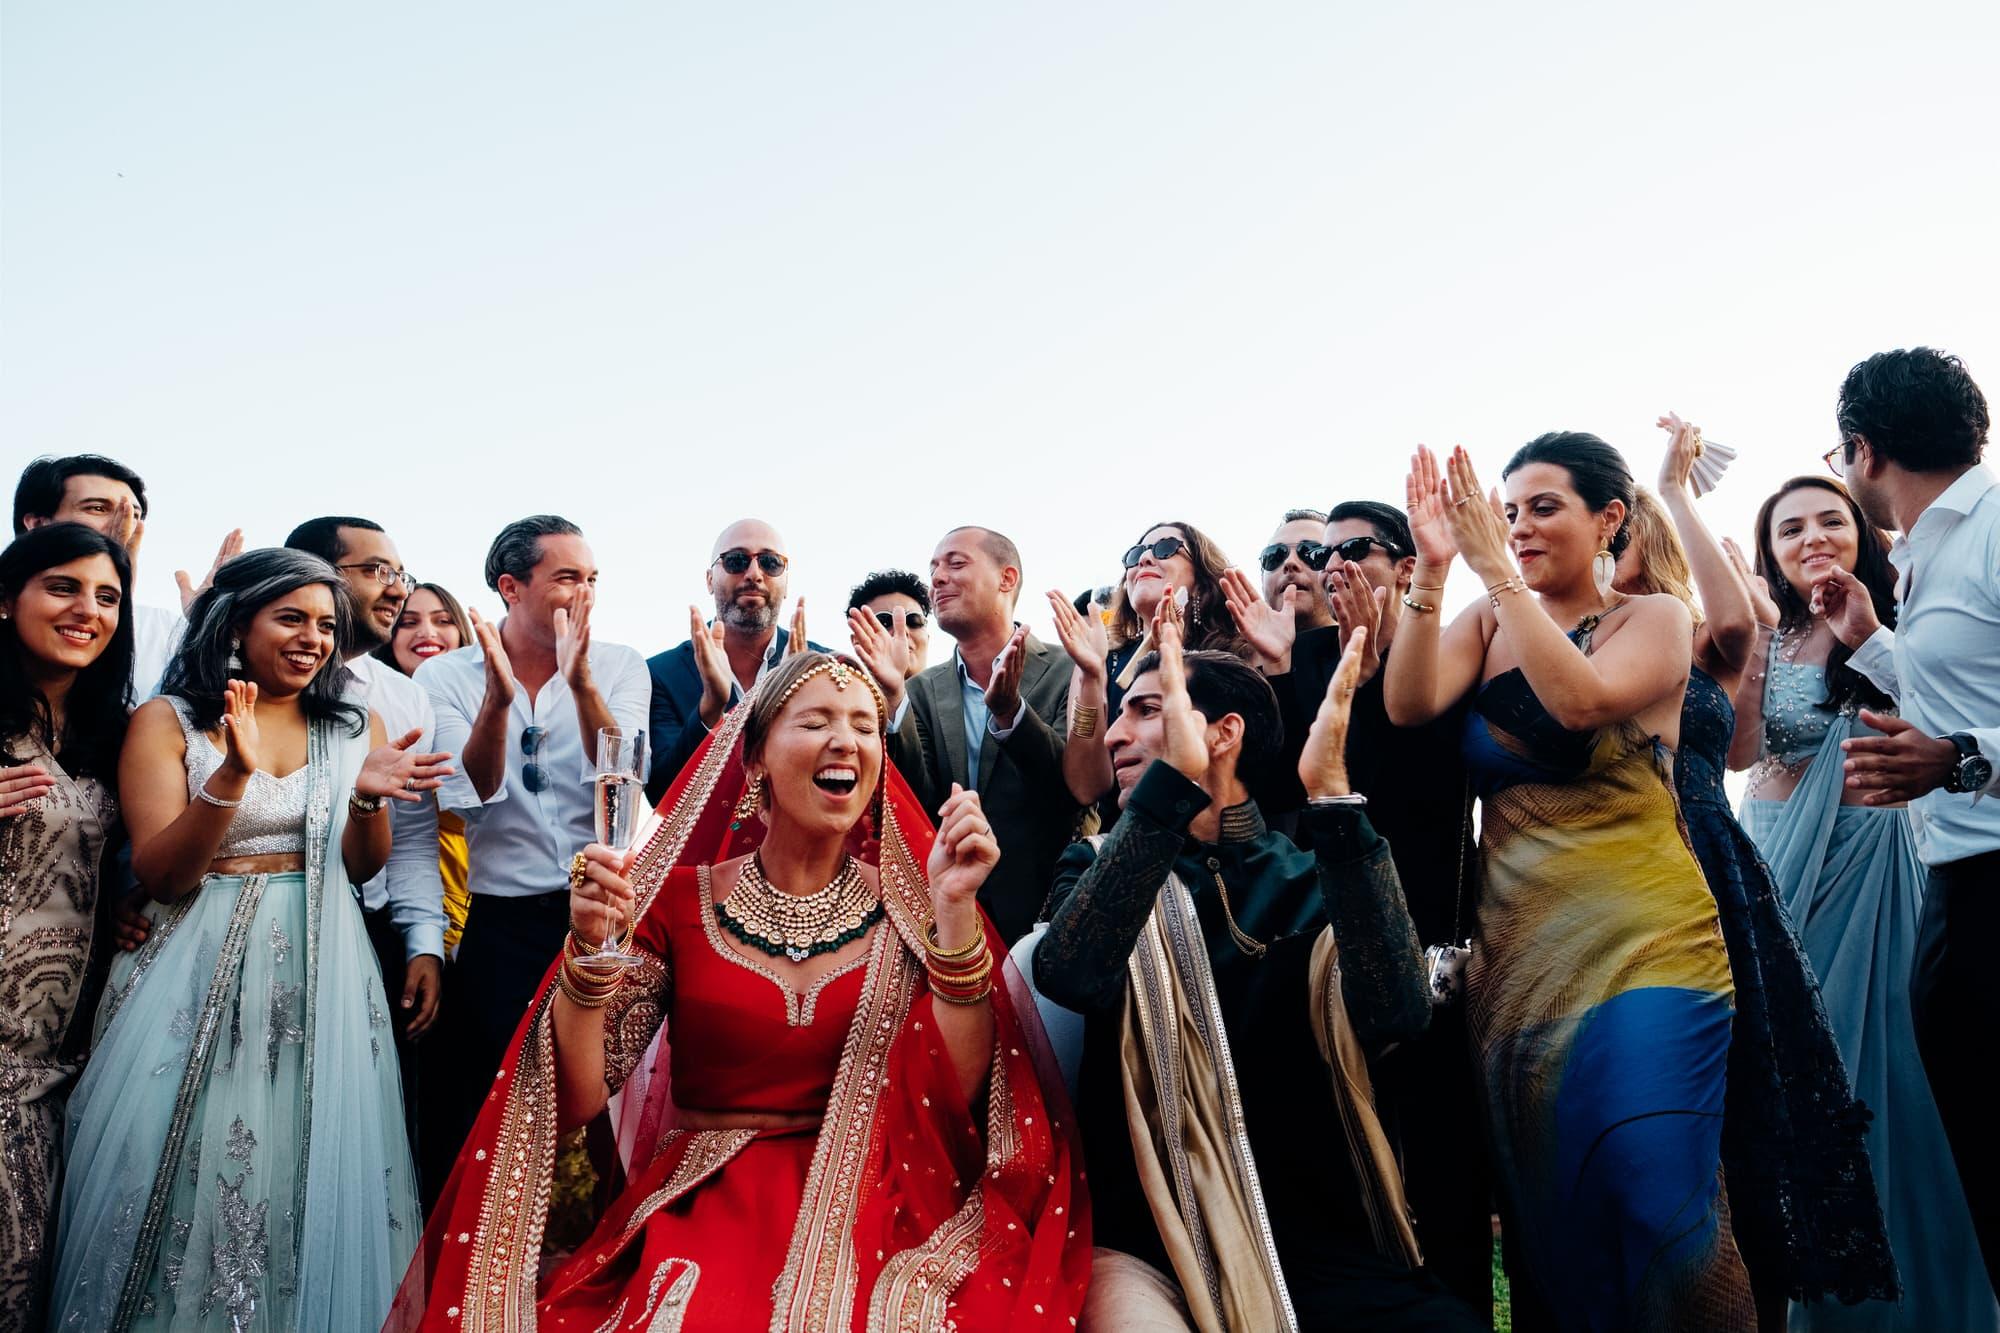 Belmond timeo taormina wedding